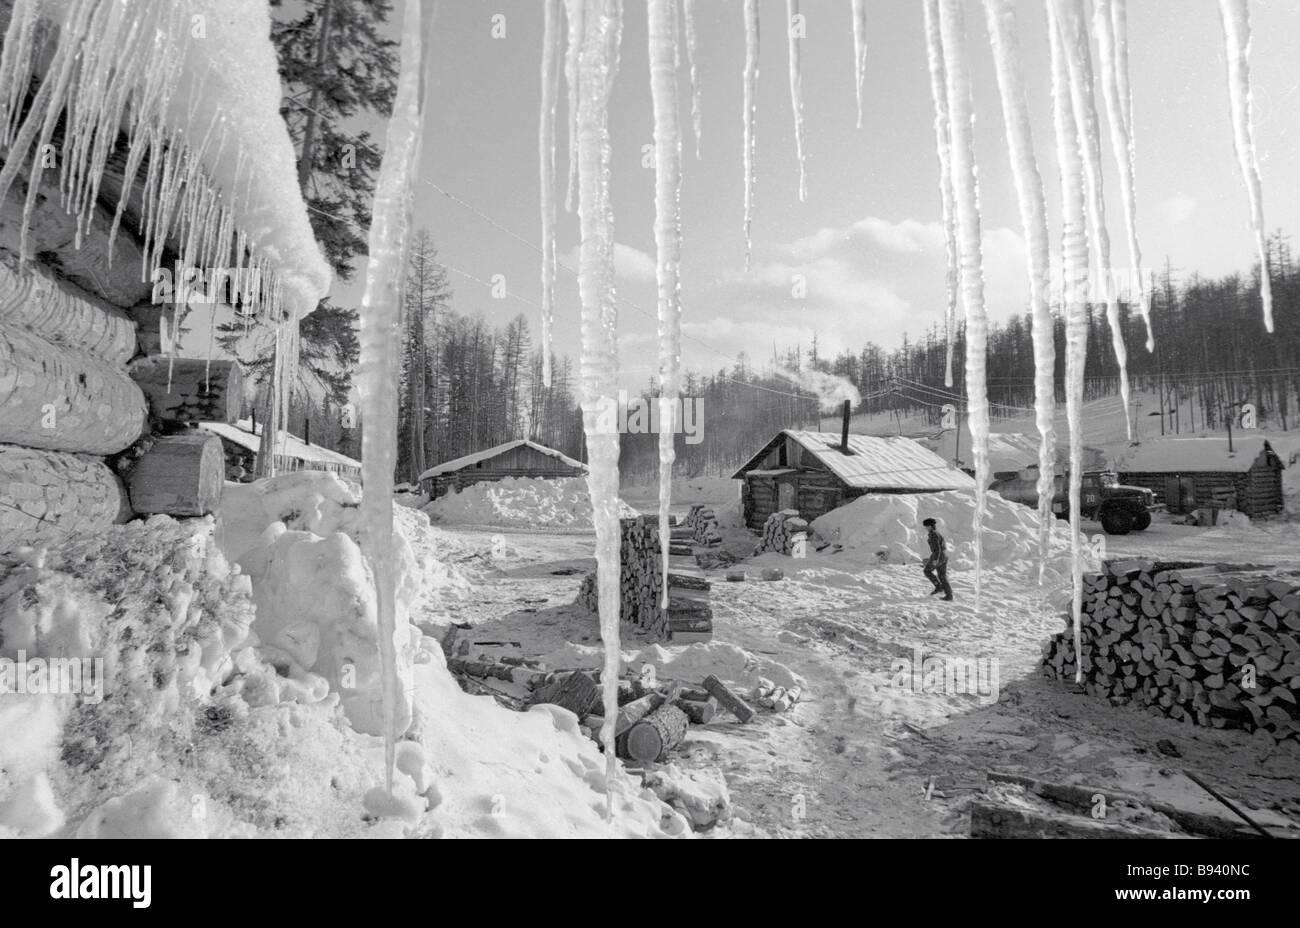 Prospectors settlement - Stock Image